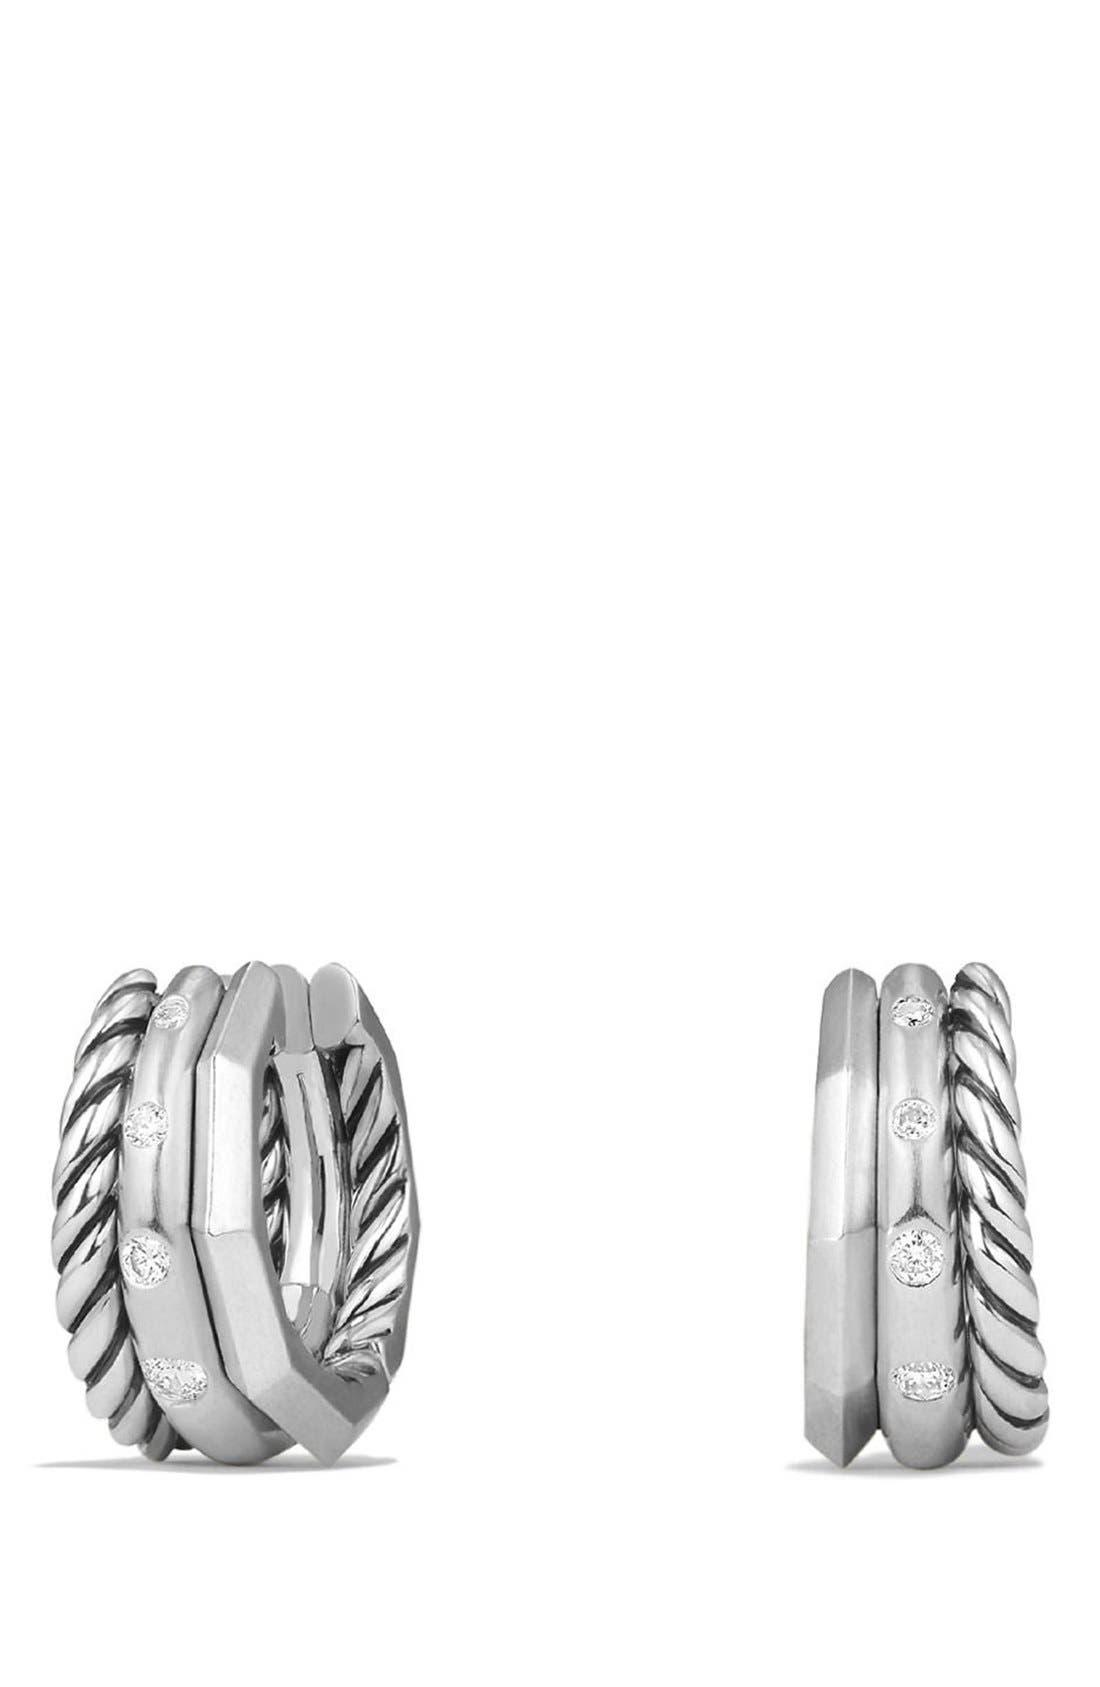 DAVID YURMAN 'Stax' Diamond Huggie Hoop Earrings, Main, color, SILVER